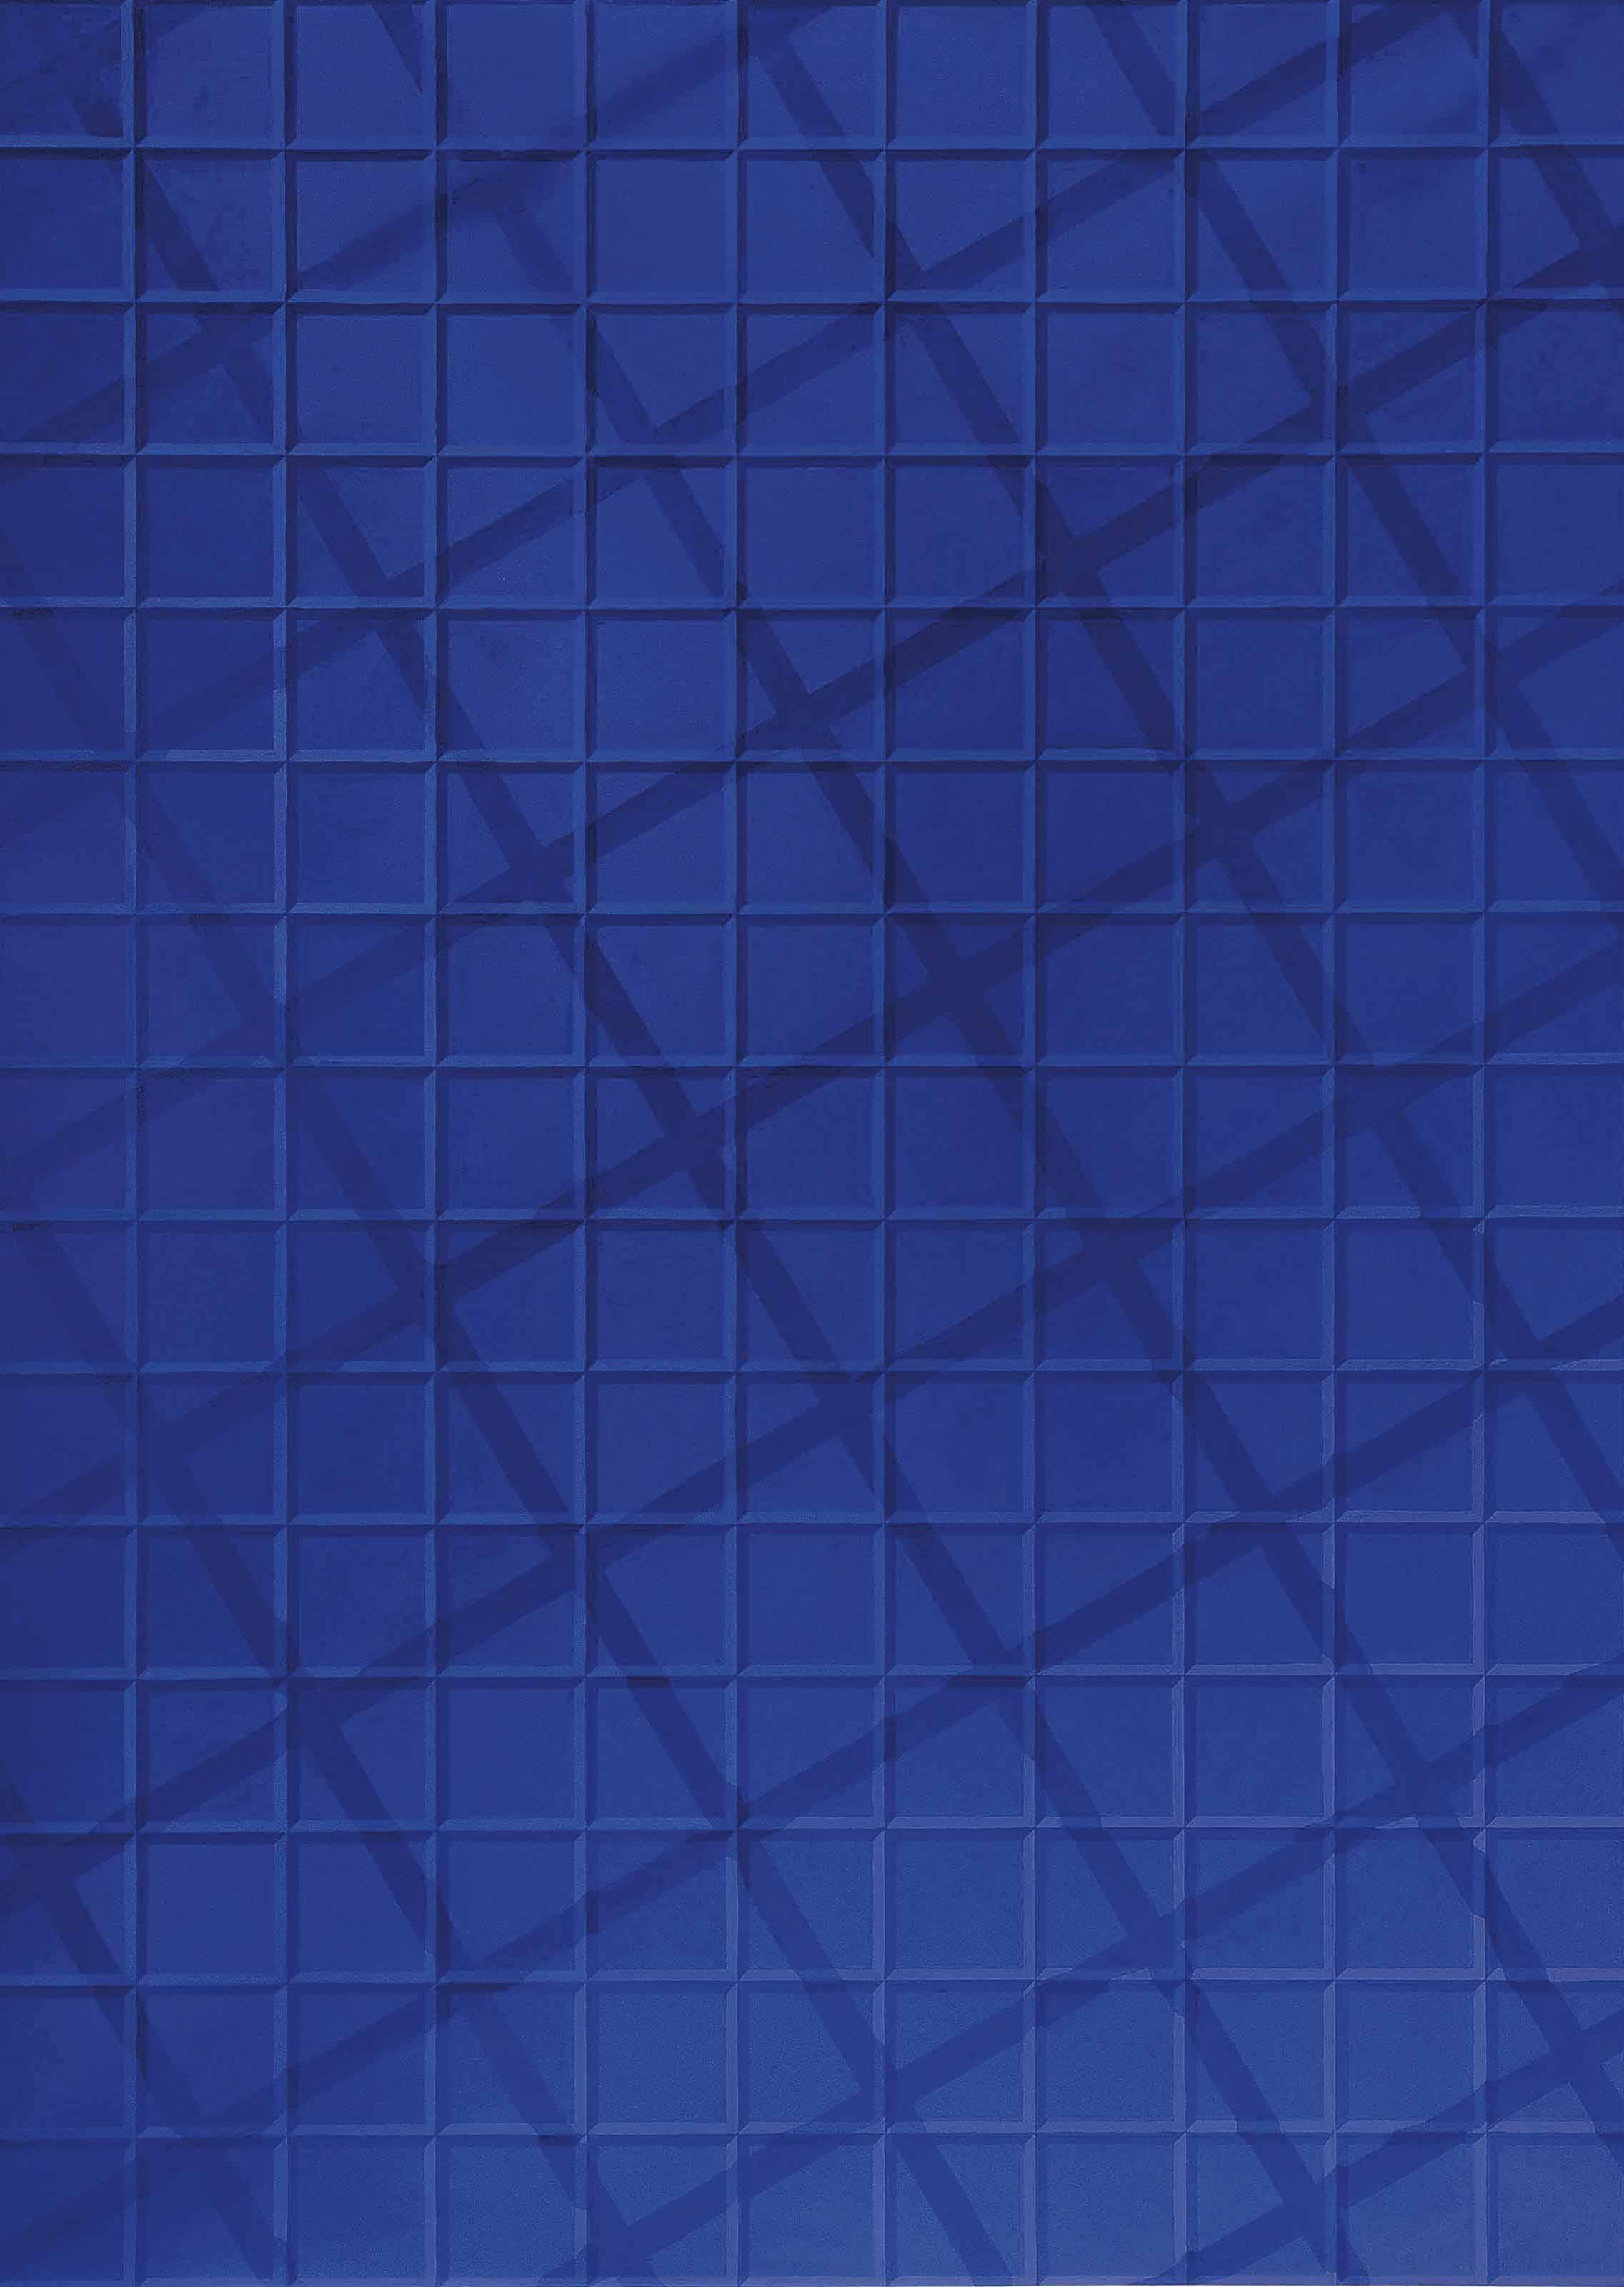 Blau (775)